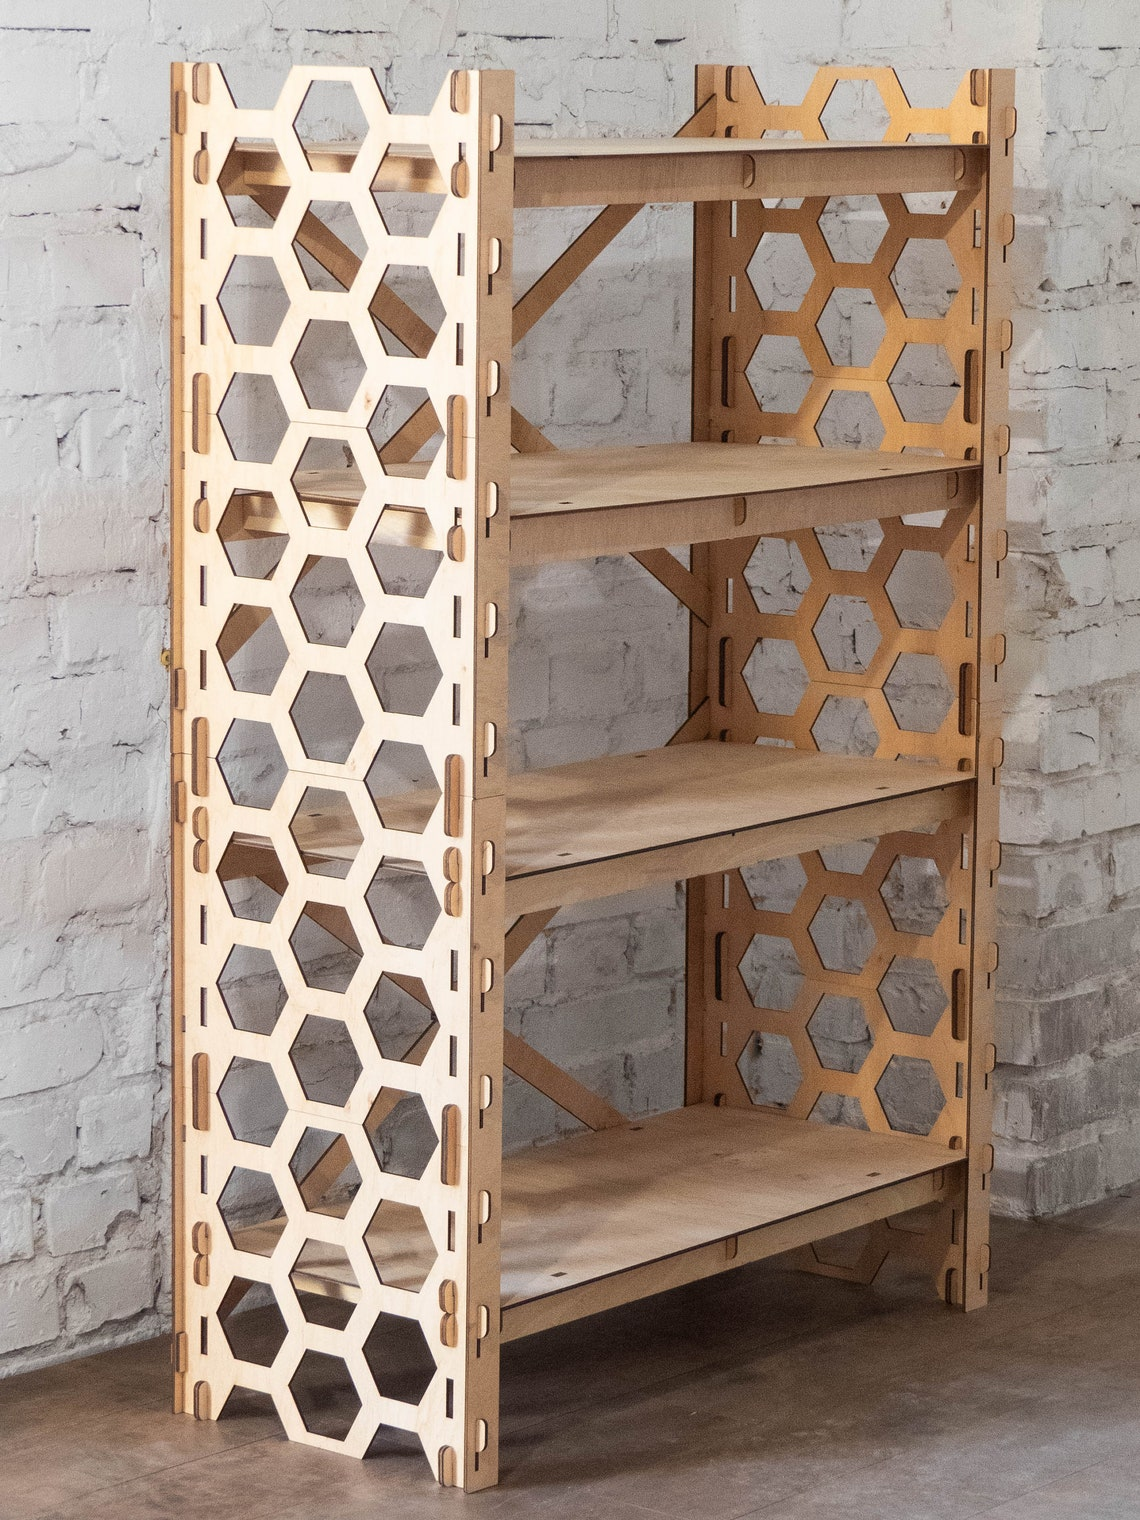 "Bookshelf Toy Storage Bookcase Plant Stand Shelving Unit Wooden Shelves Housewarming Gift Laser Cut ""HONEYCOMB"" (31""w 48""h) Hexagonica"